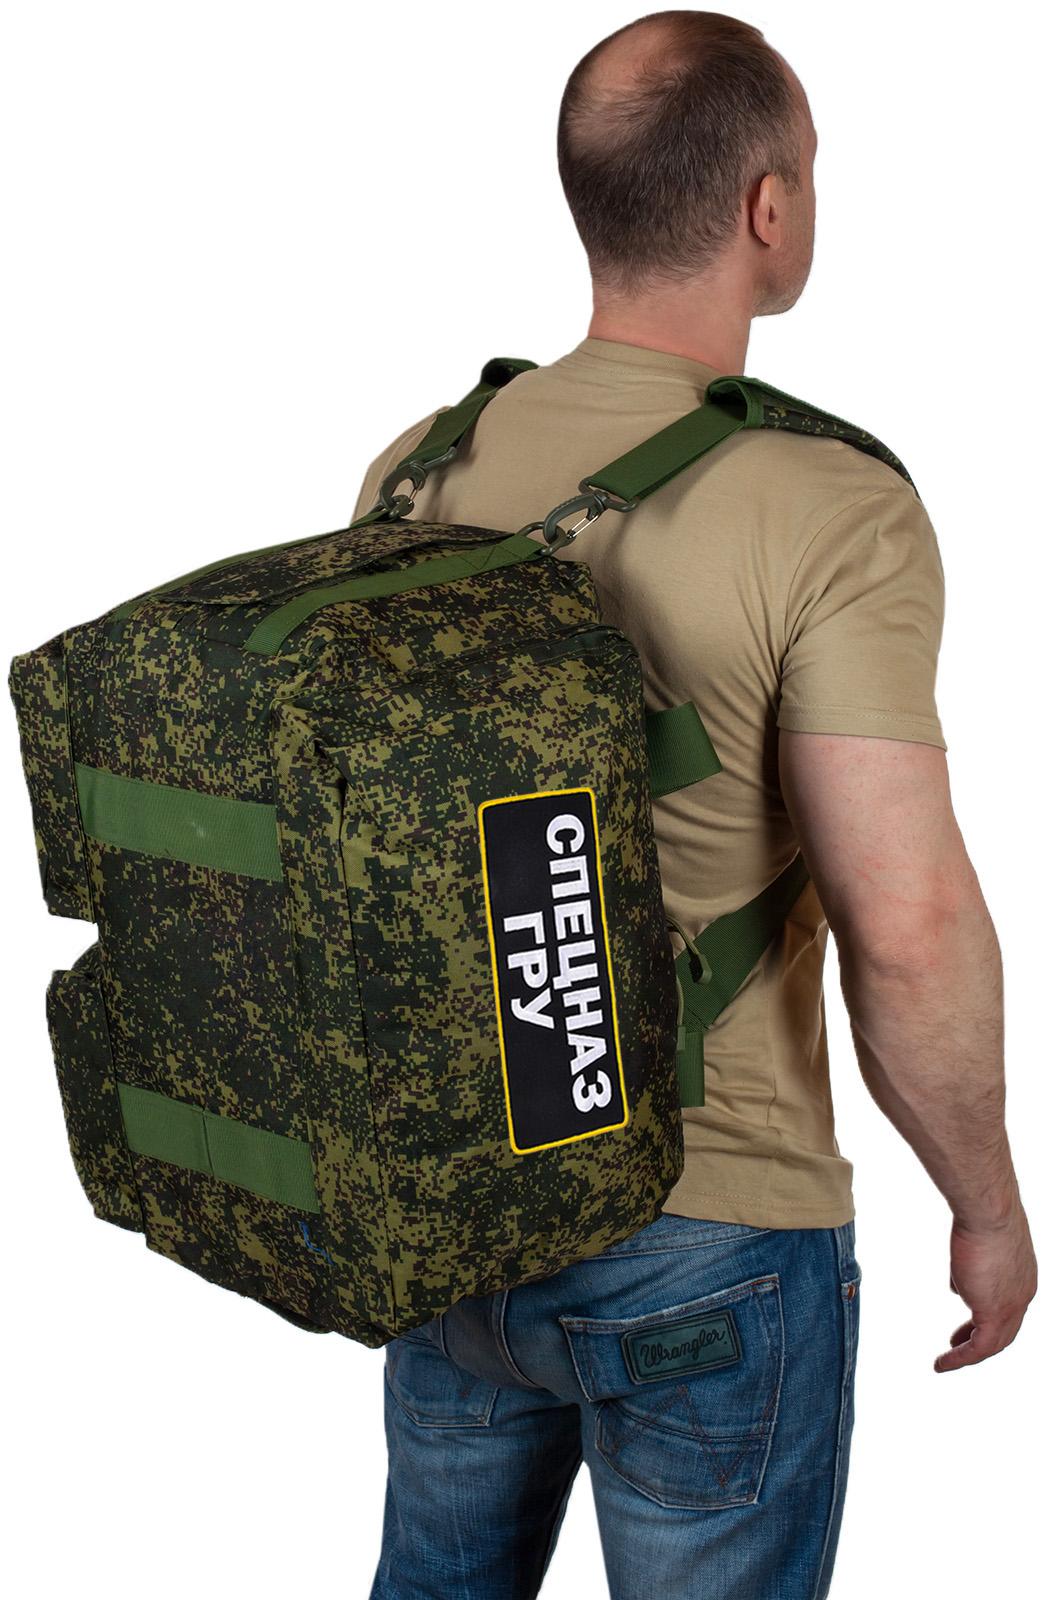 Недорогая камуфляжная сумка рюкзак Спецназ ГРУ